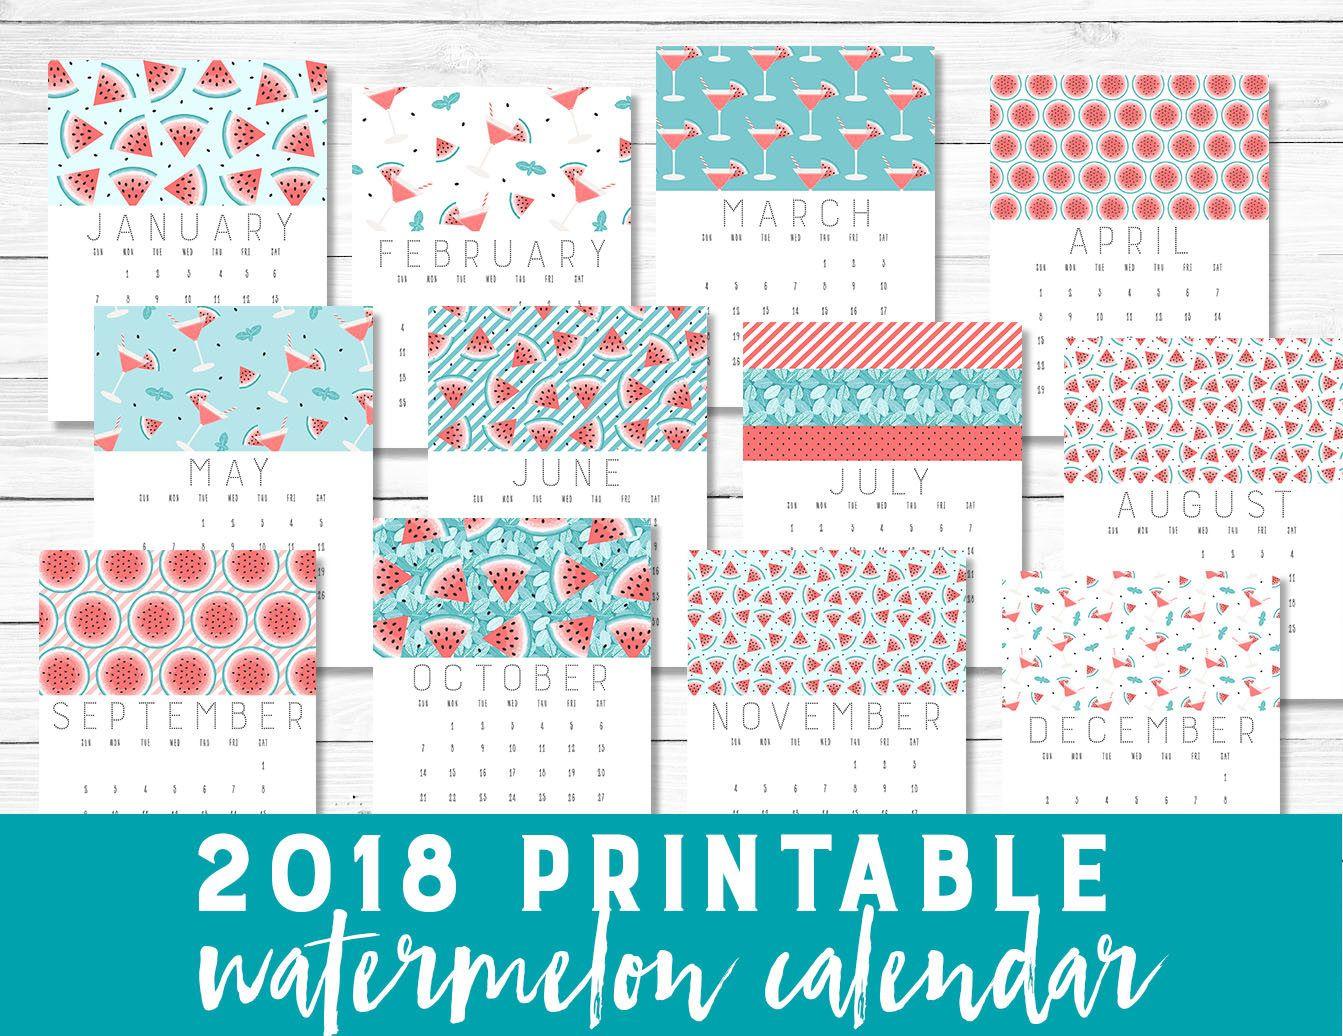 Printable 2018 Calendar Watermelon Pastel Teal Coral Calendar